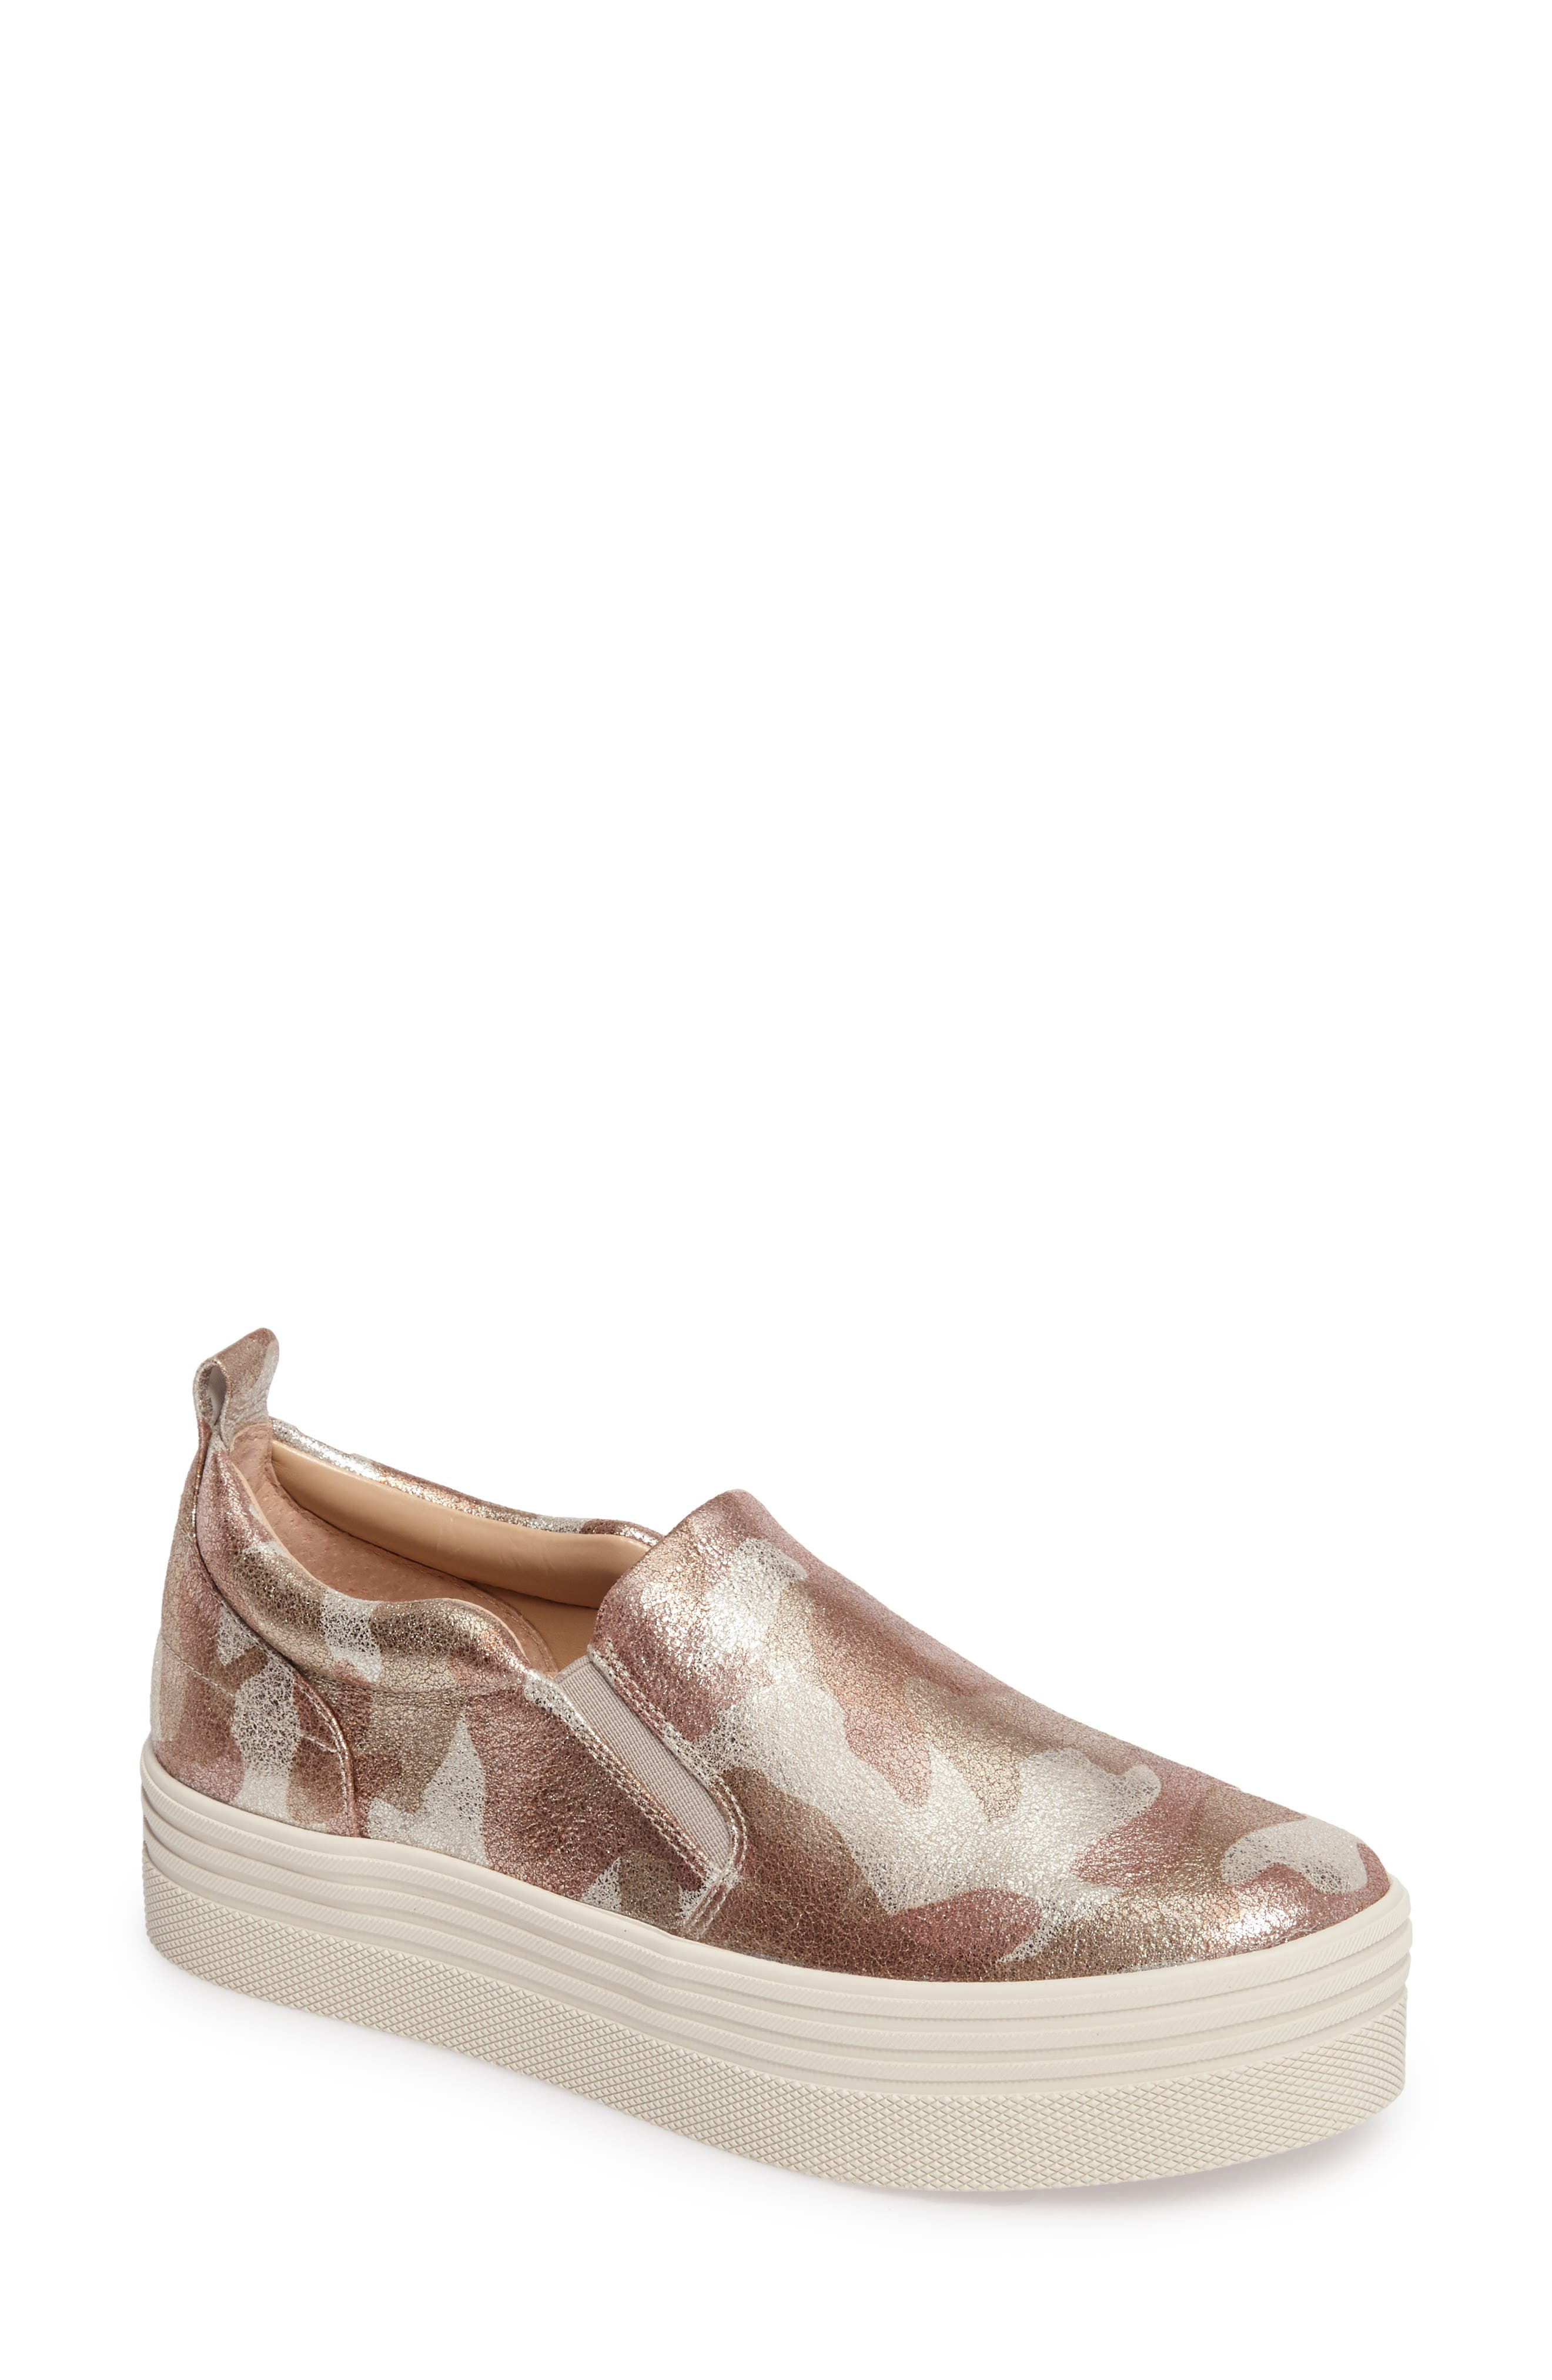 Main Image - Marc Fisher LTD Elise Platform Sneaker (Women)